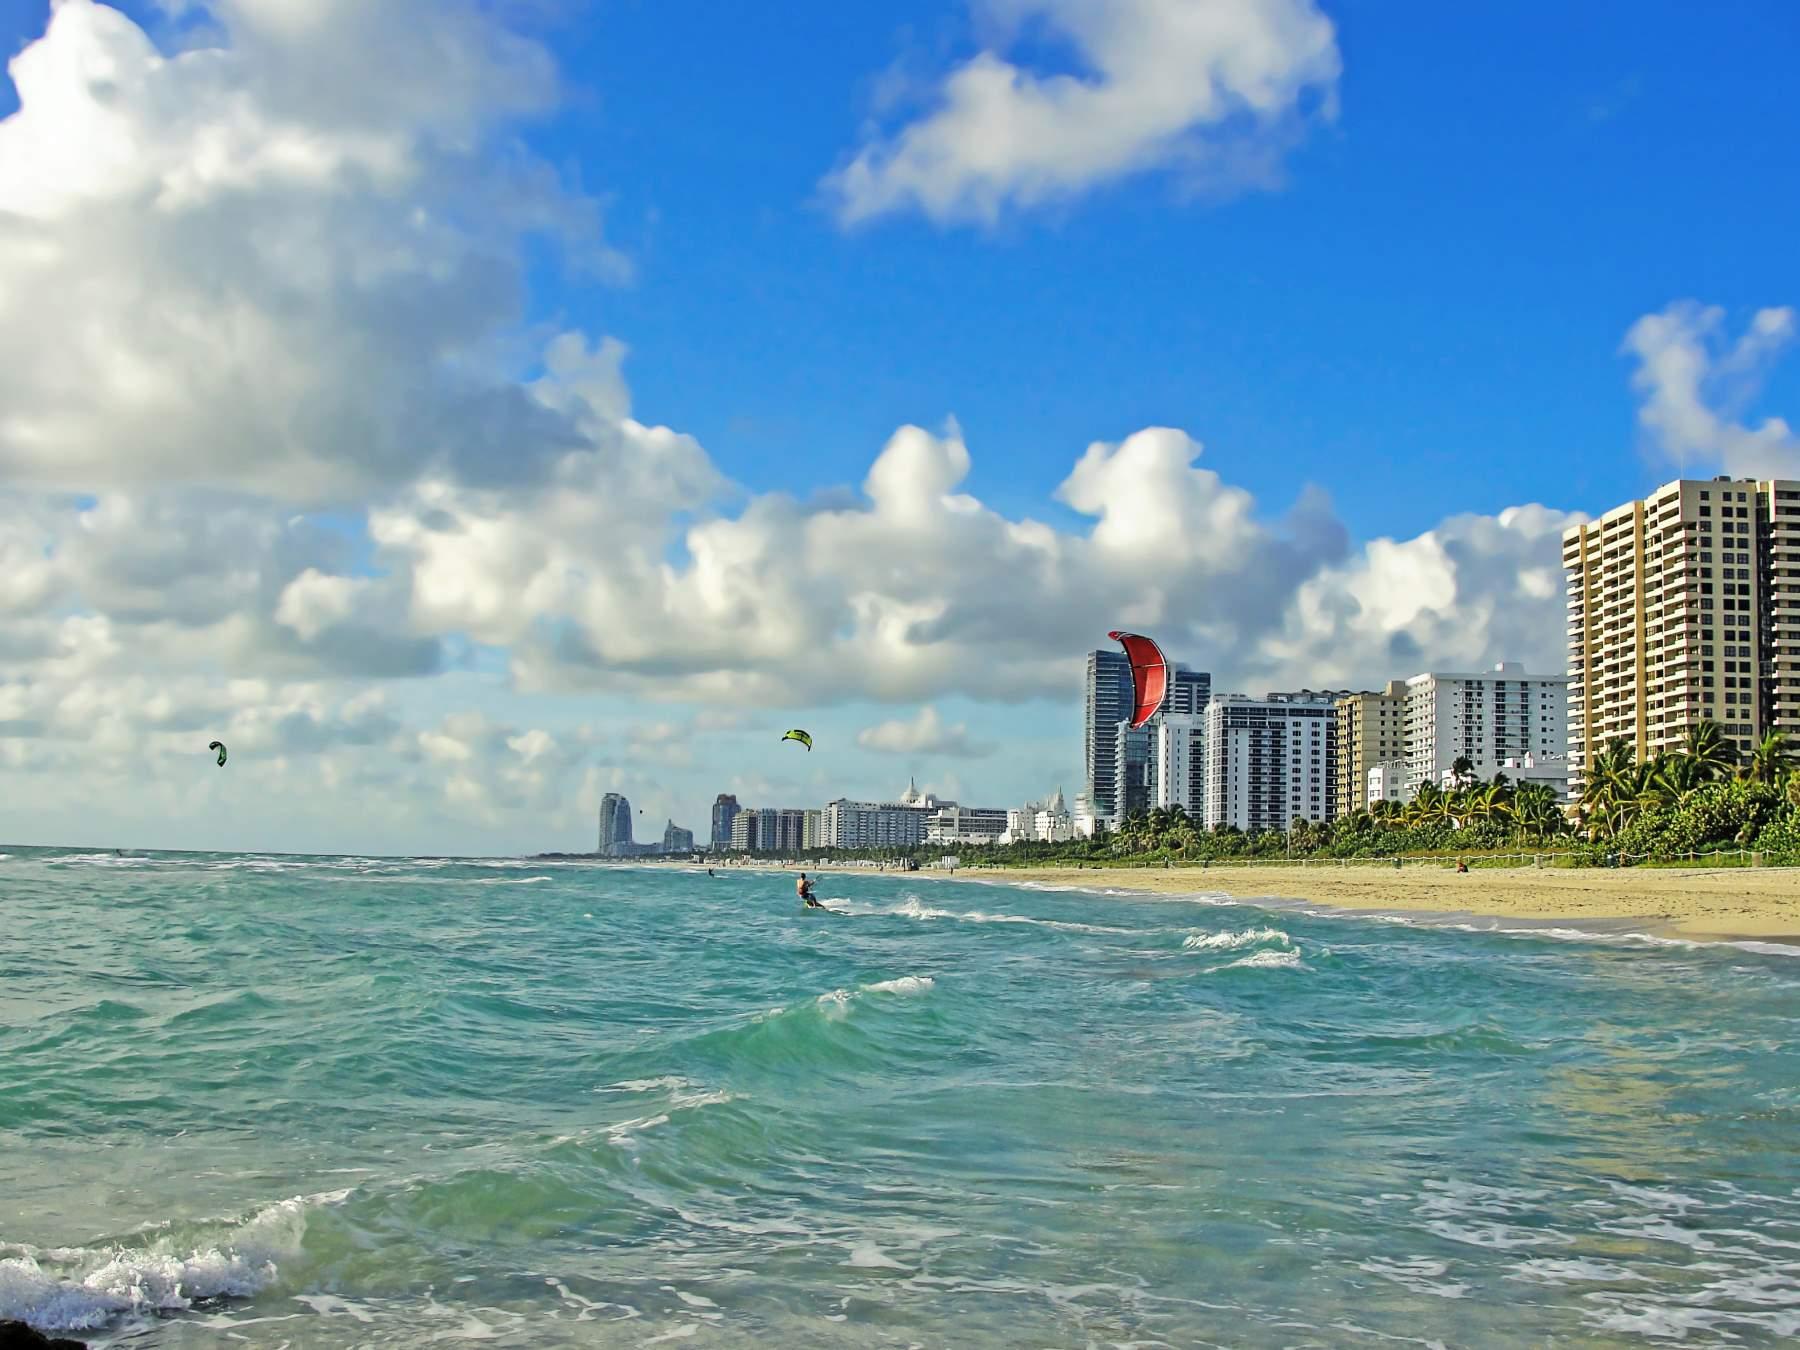 Guide til hvor man skal bo i Miami - Rejs Dig Lykkelig